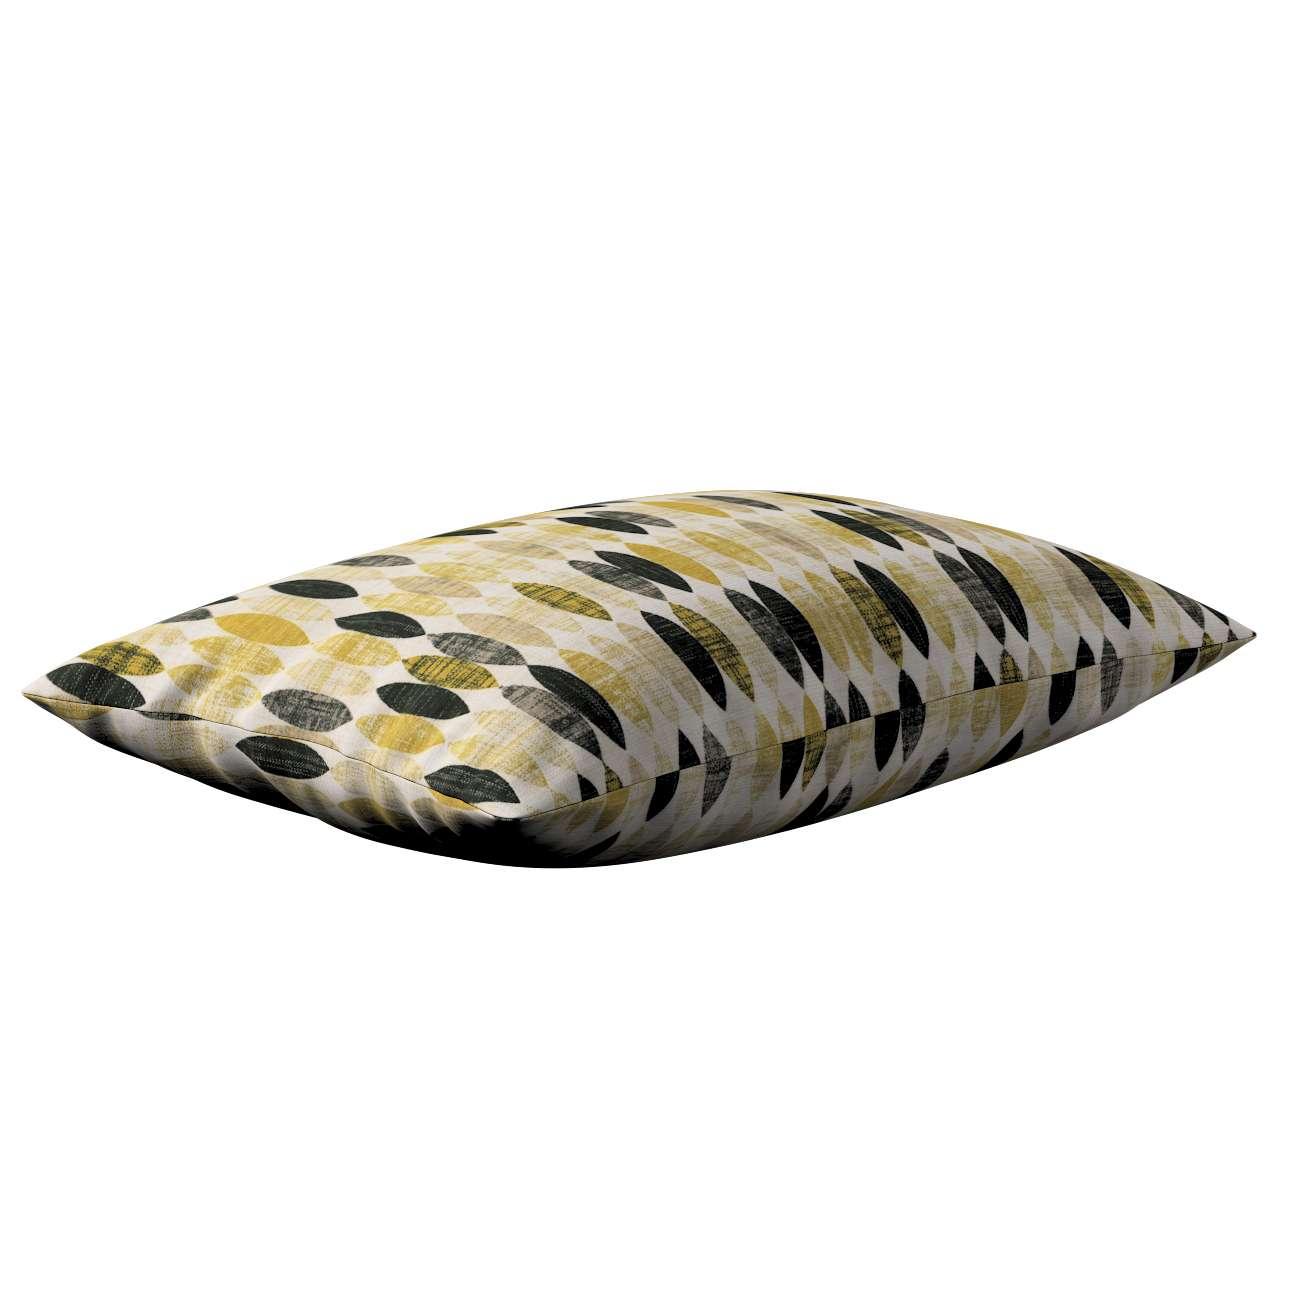 Kinga - potah na polštář jednoduchý obdélníkový v kolekci Modern, látka: 142-99